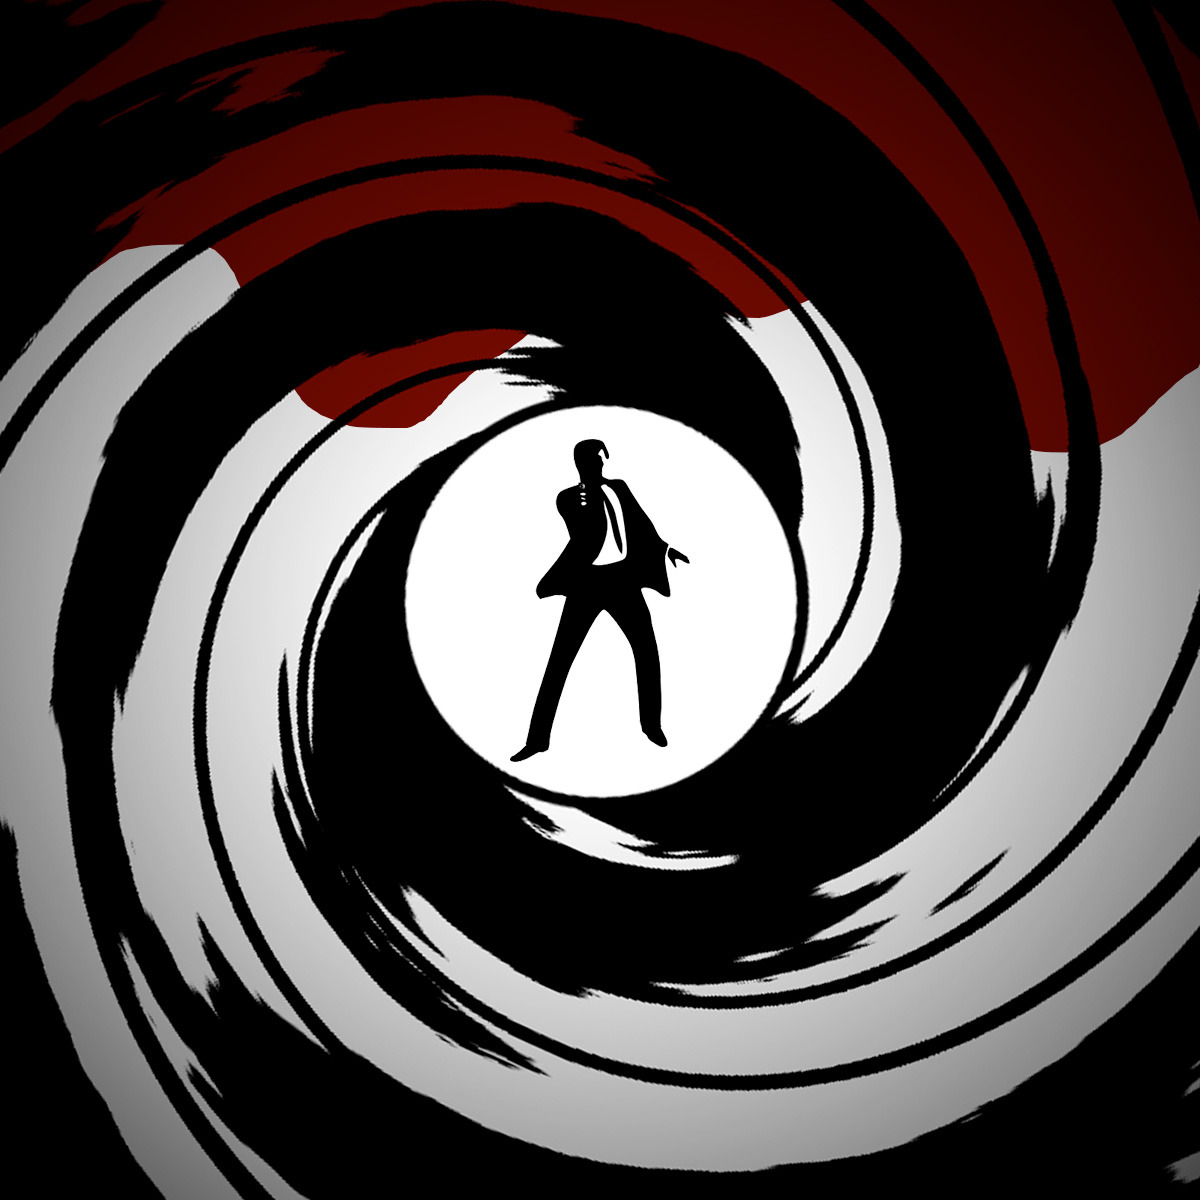 53 james bond 007 wallpaper on wallpapersafari - 007 wallpaper 4k ...